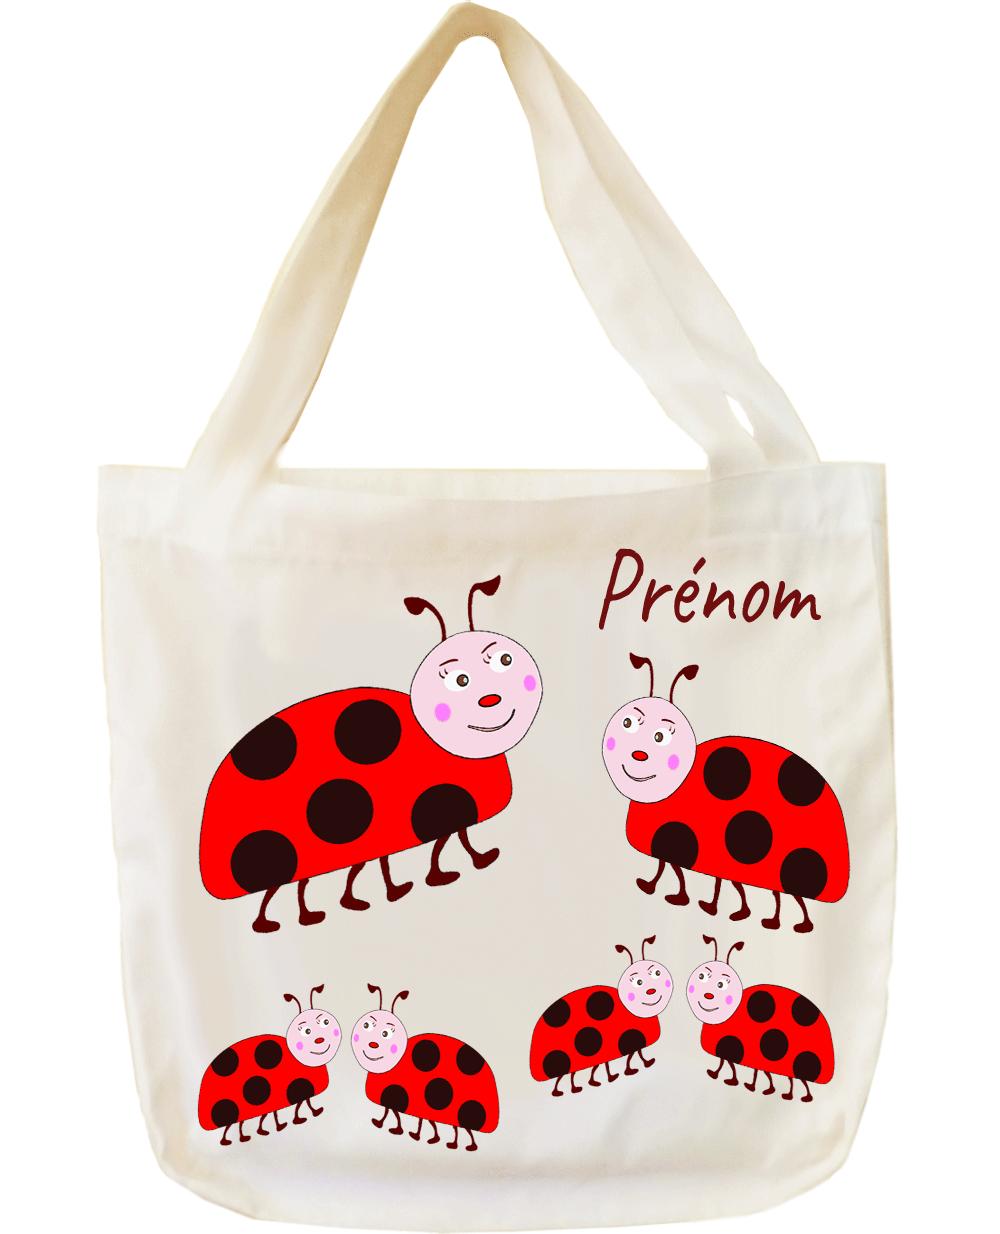 tote-bag;sac;cabas;texti;cadeaux;personnalisable;personnalisation;personnalise;prenom;animal;coccinelle